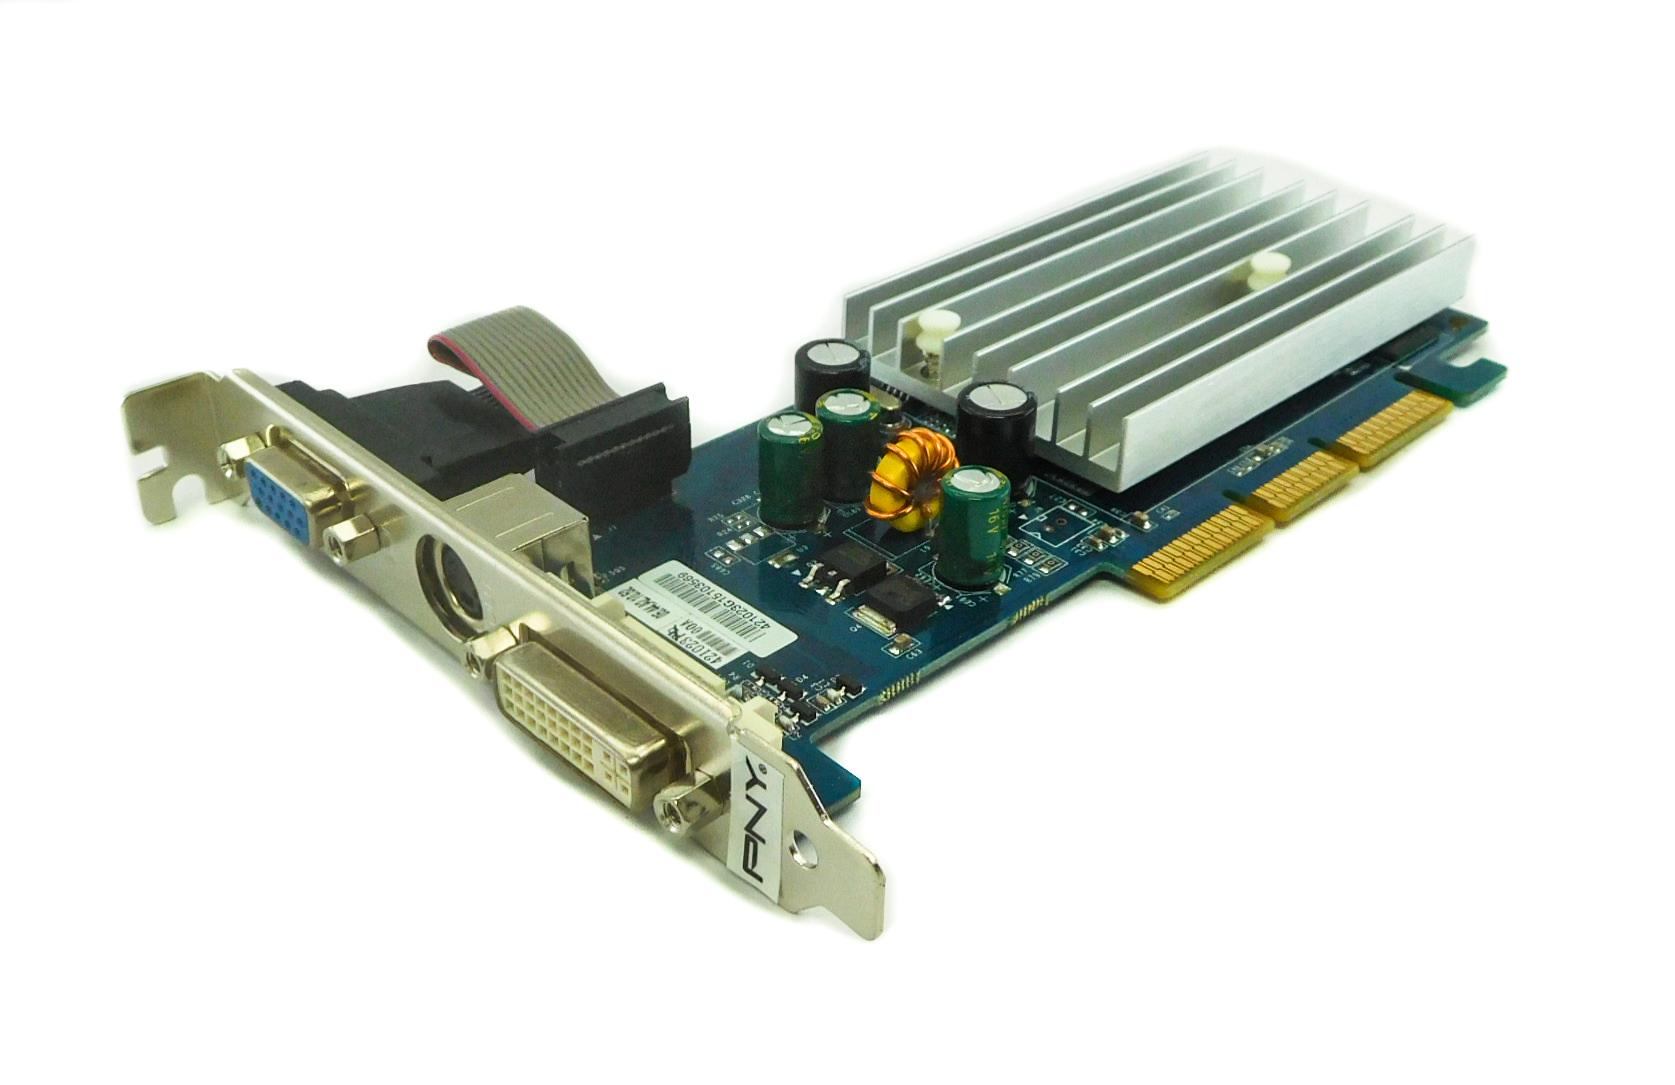 PNY G606200A8E49D 512MB GeForce 6200 AGP Graphics Card